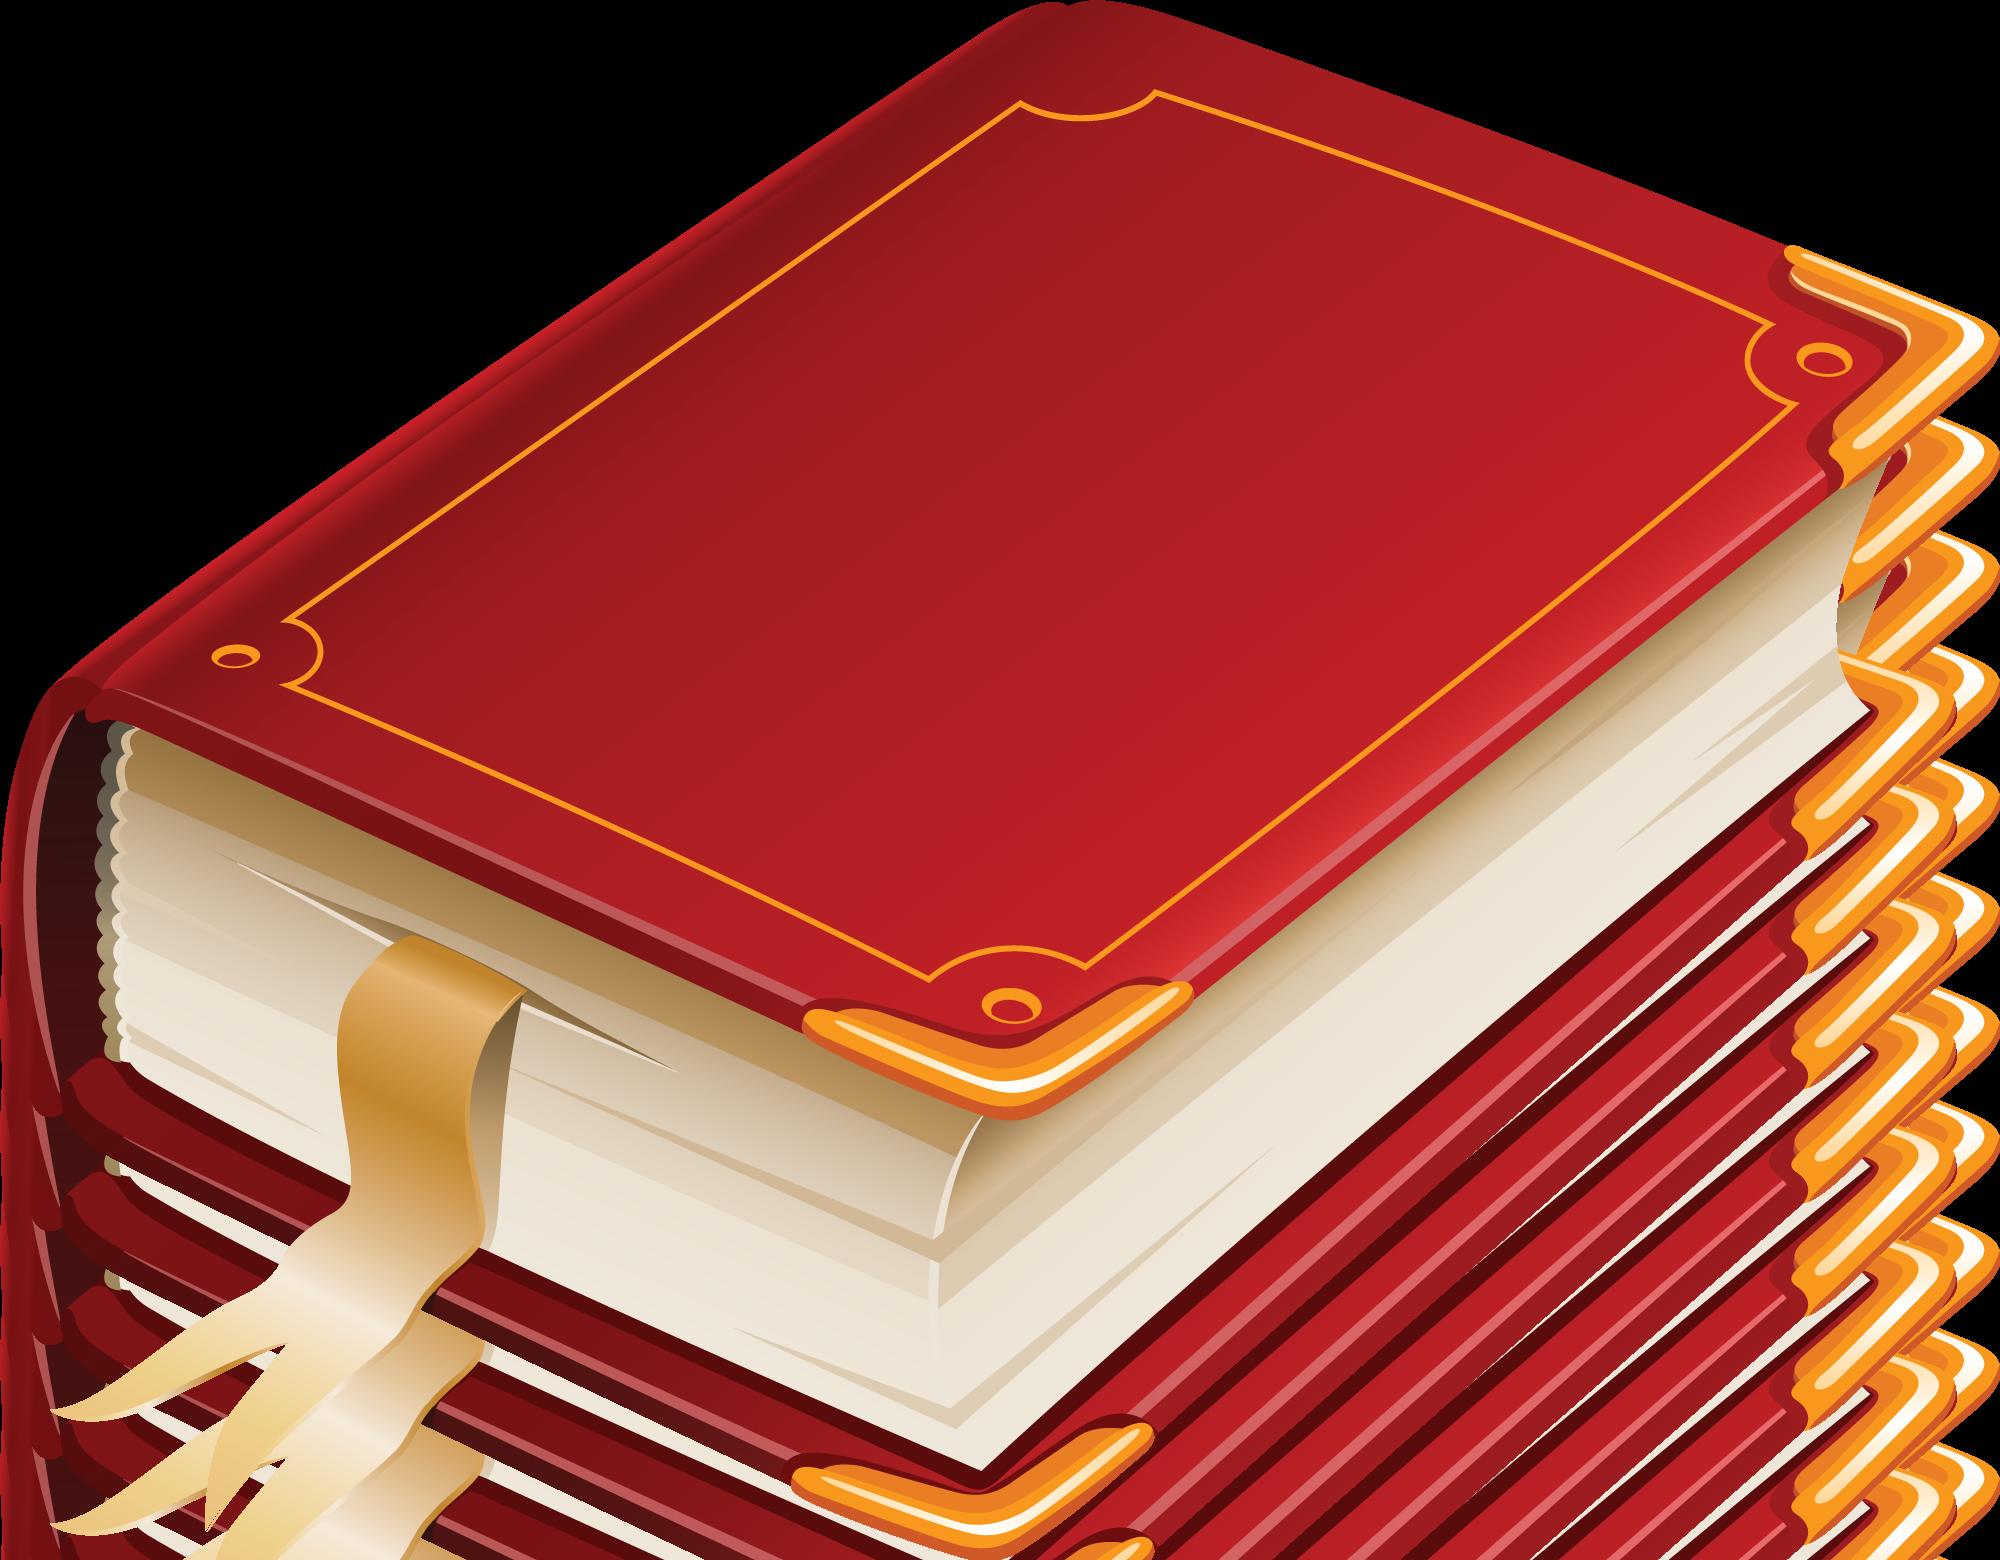 Book image clip art download book image clip art download